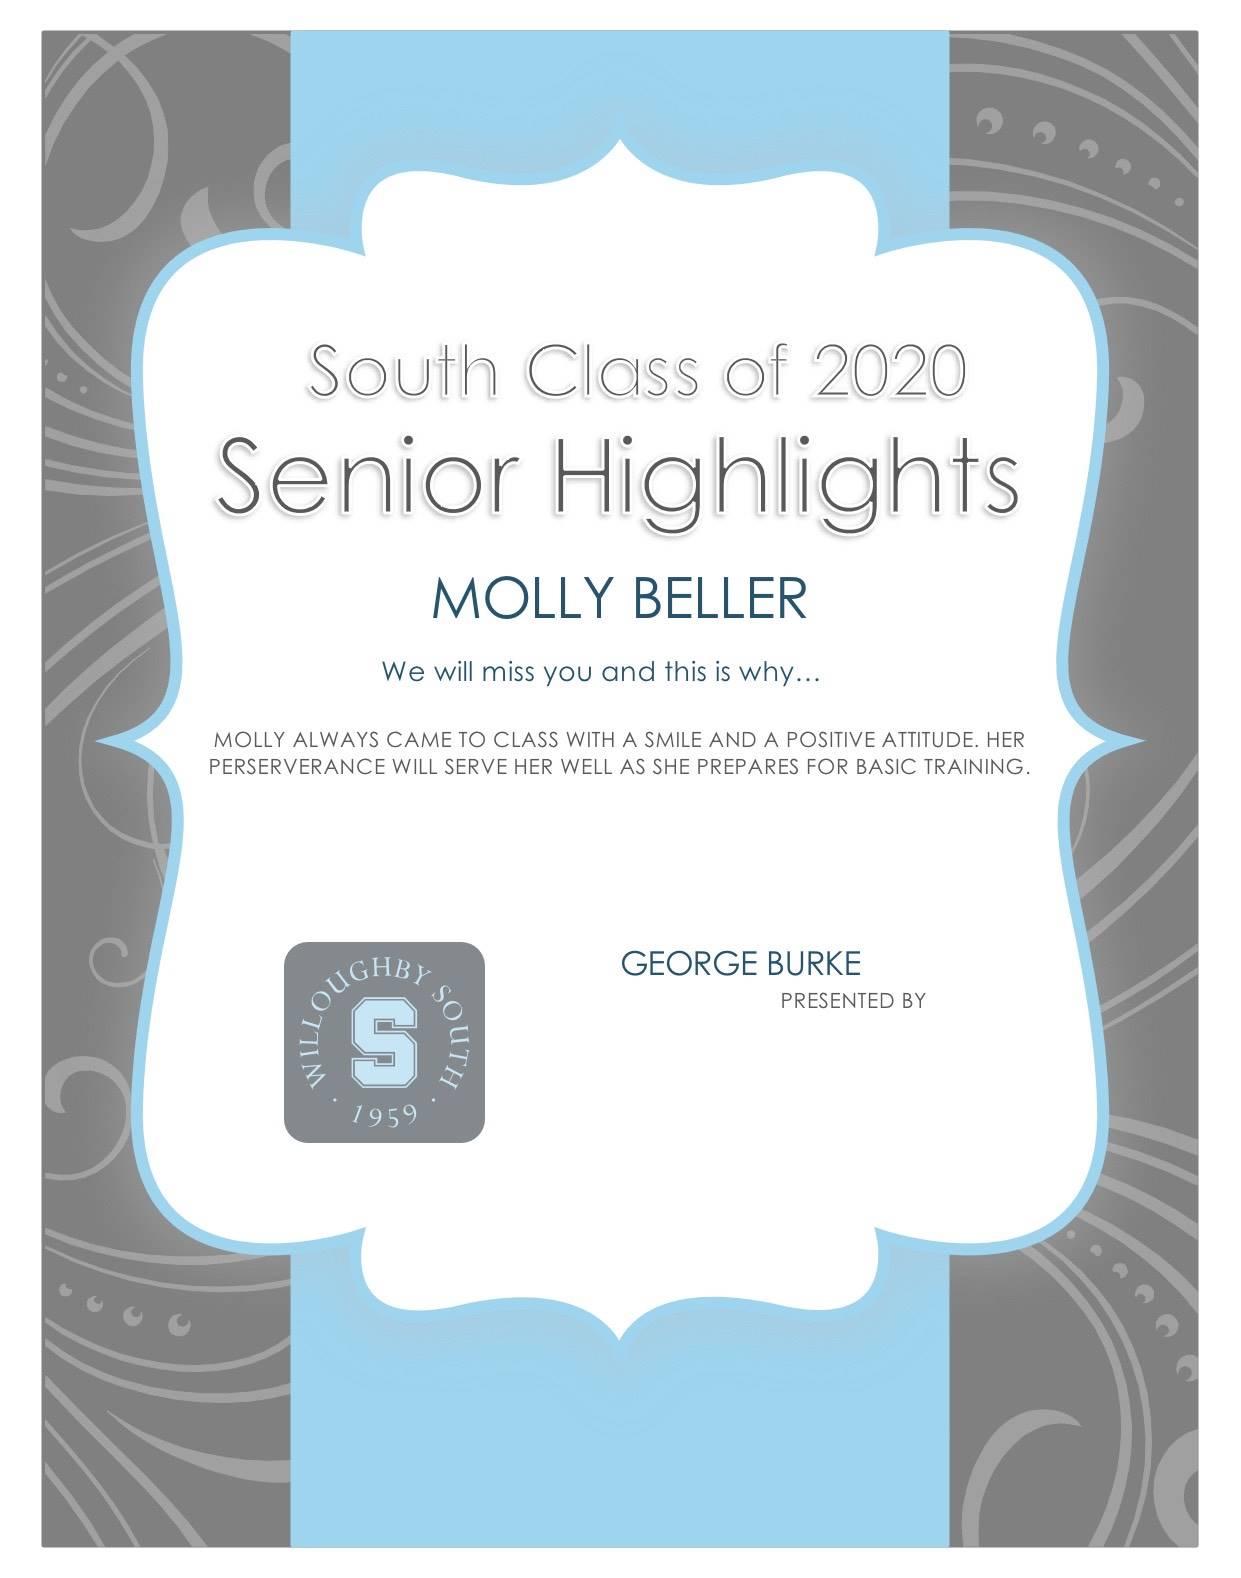 Molly Beller